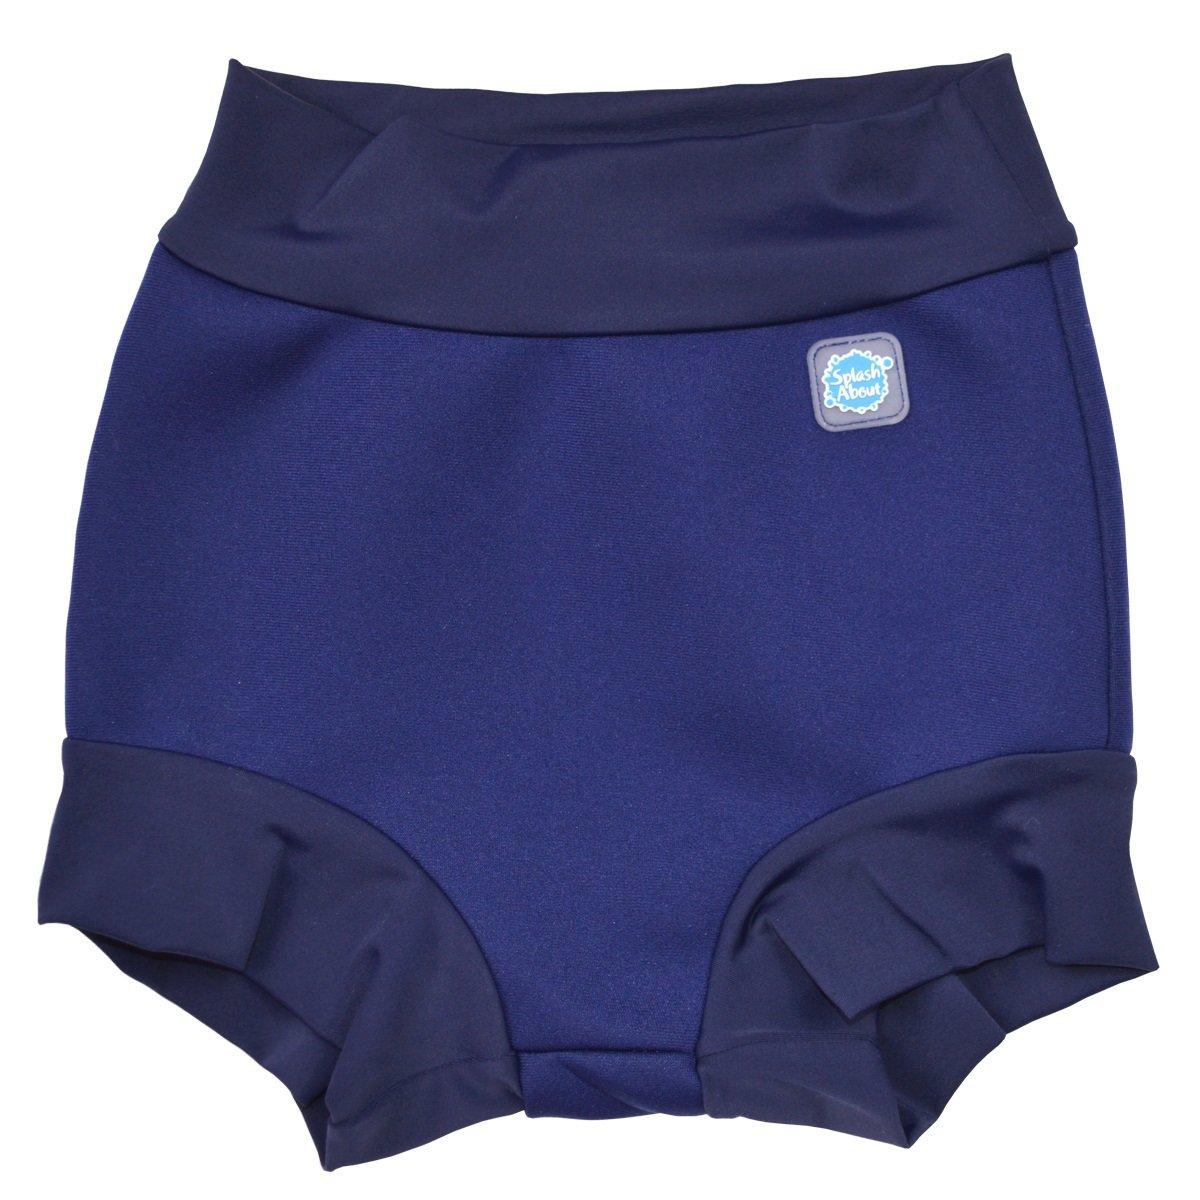 Splash About - Pantaloncini da bagno per bambini